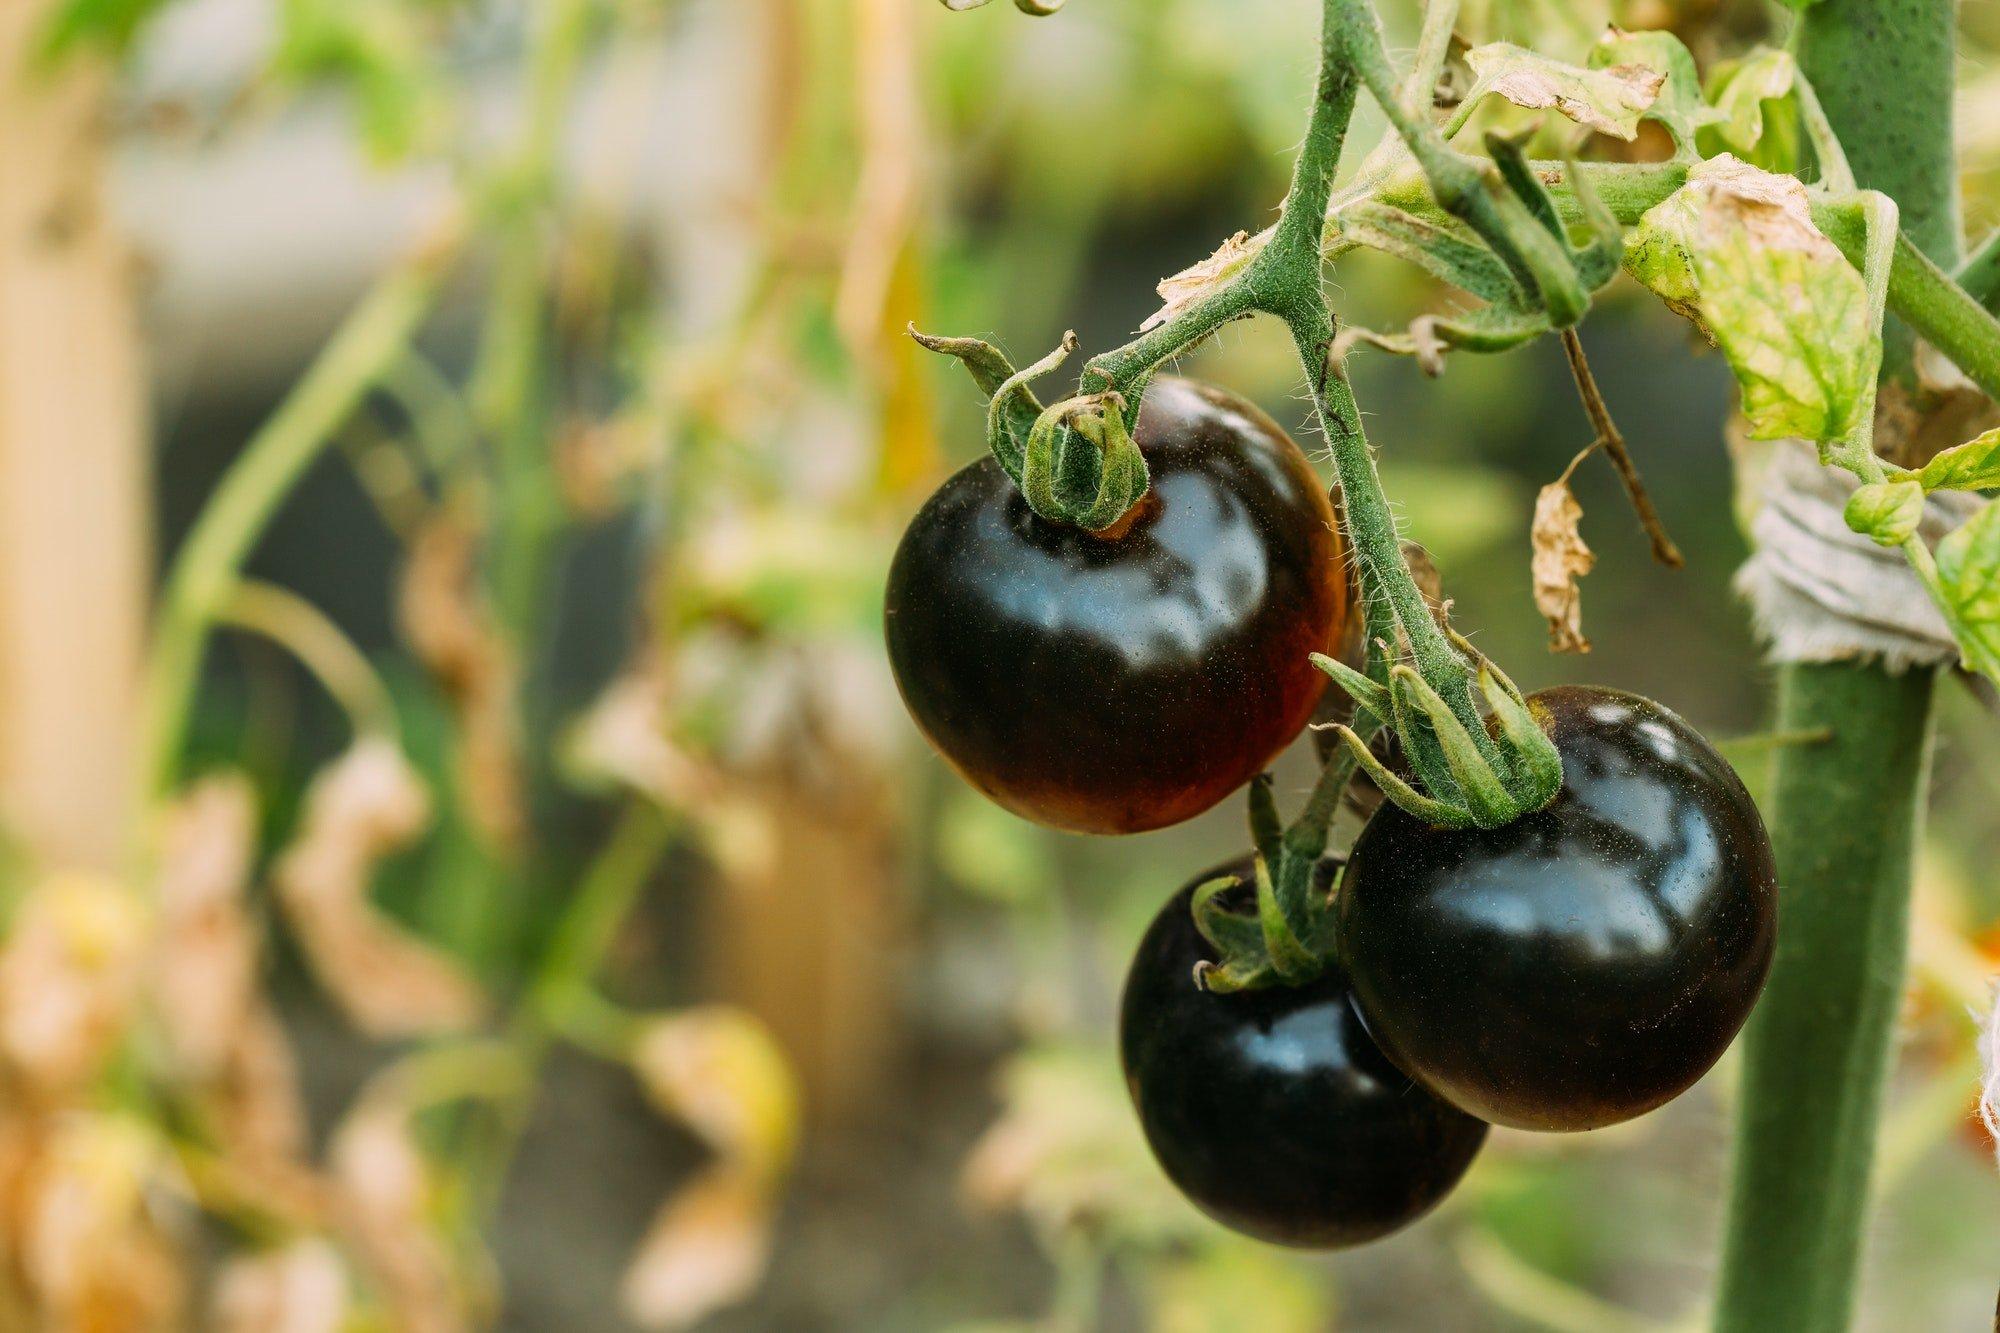 Black Growing Organic Tomato. Homegrown Tomatoes In Vegetable Garden